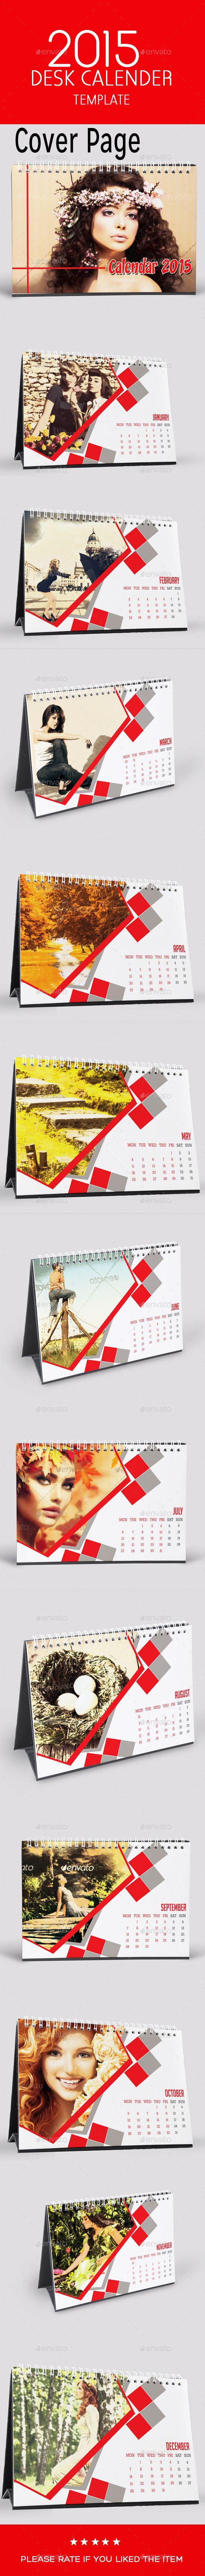 2015 Multipurpose Photo Action Desk Calendar